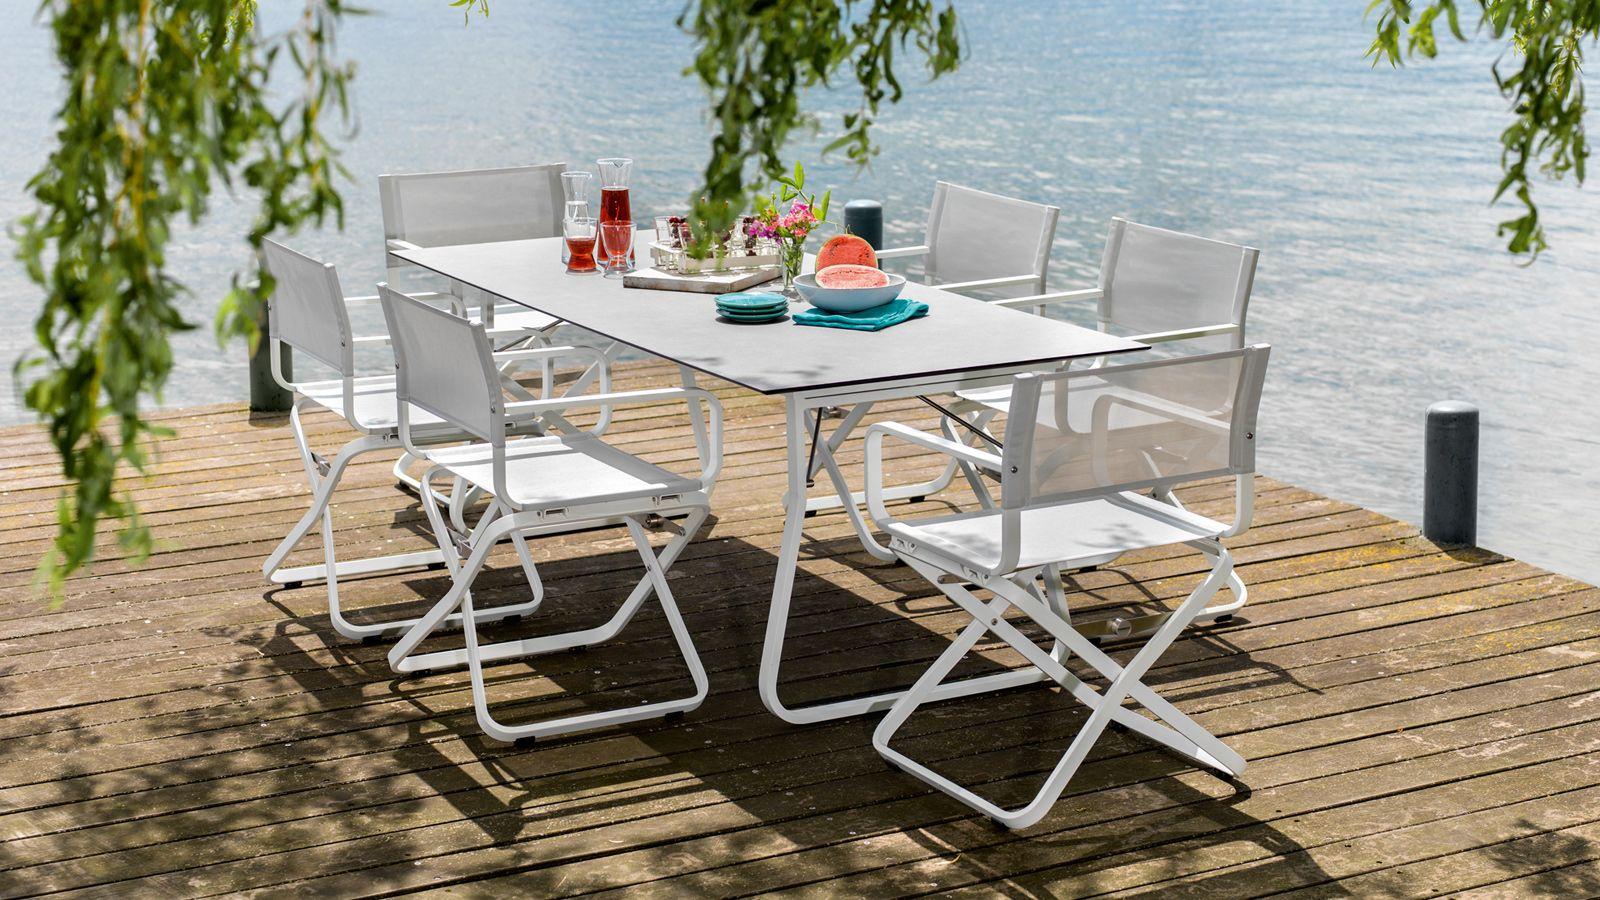 Alu Design Vaison La Romaine weishäupl werkstätten | outdoor furniture sets, outdoor